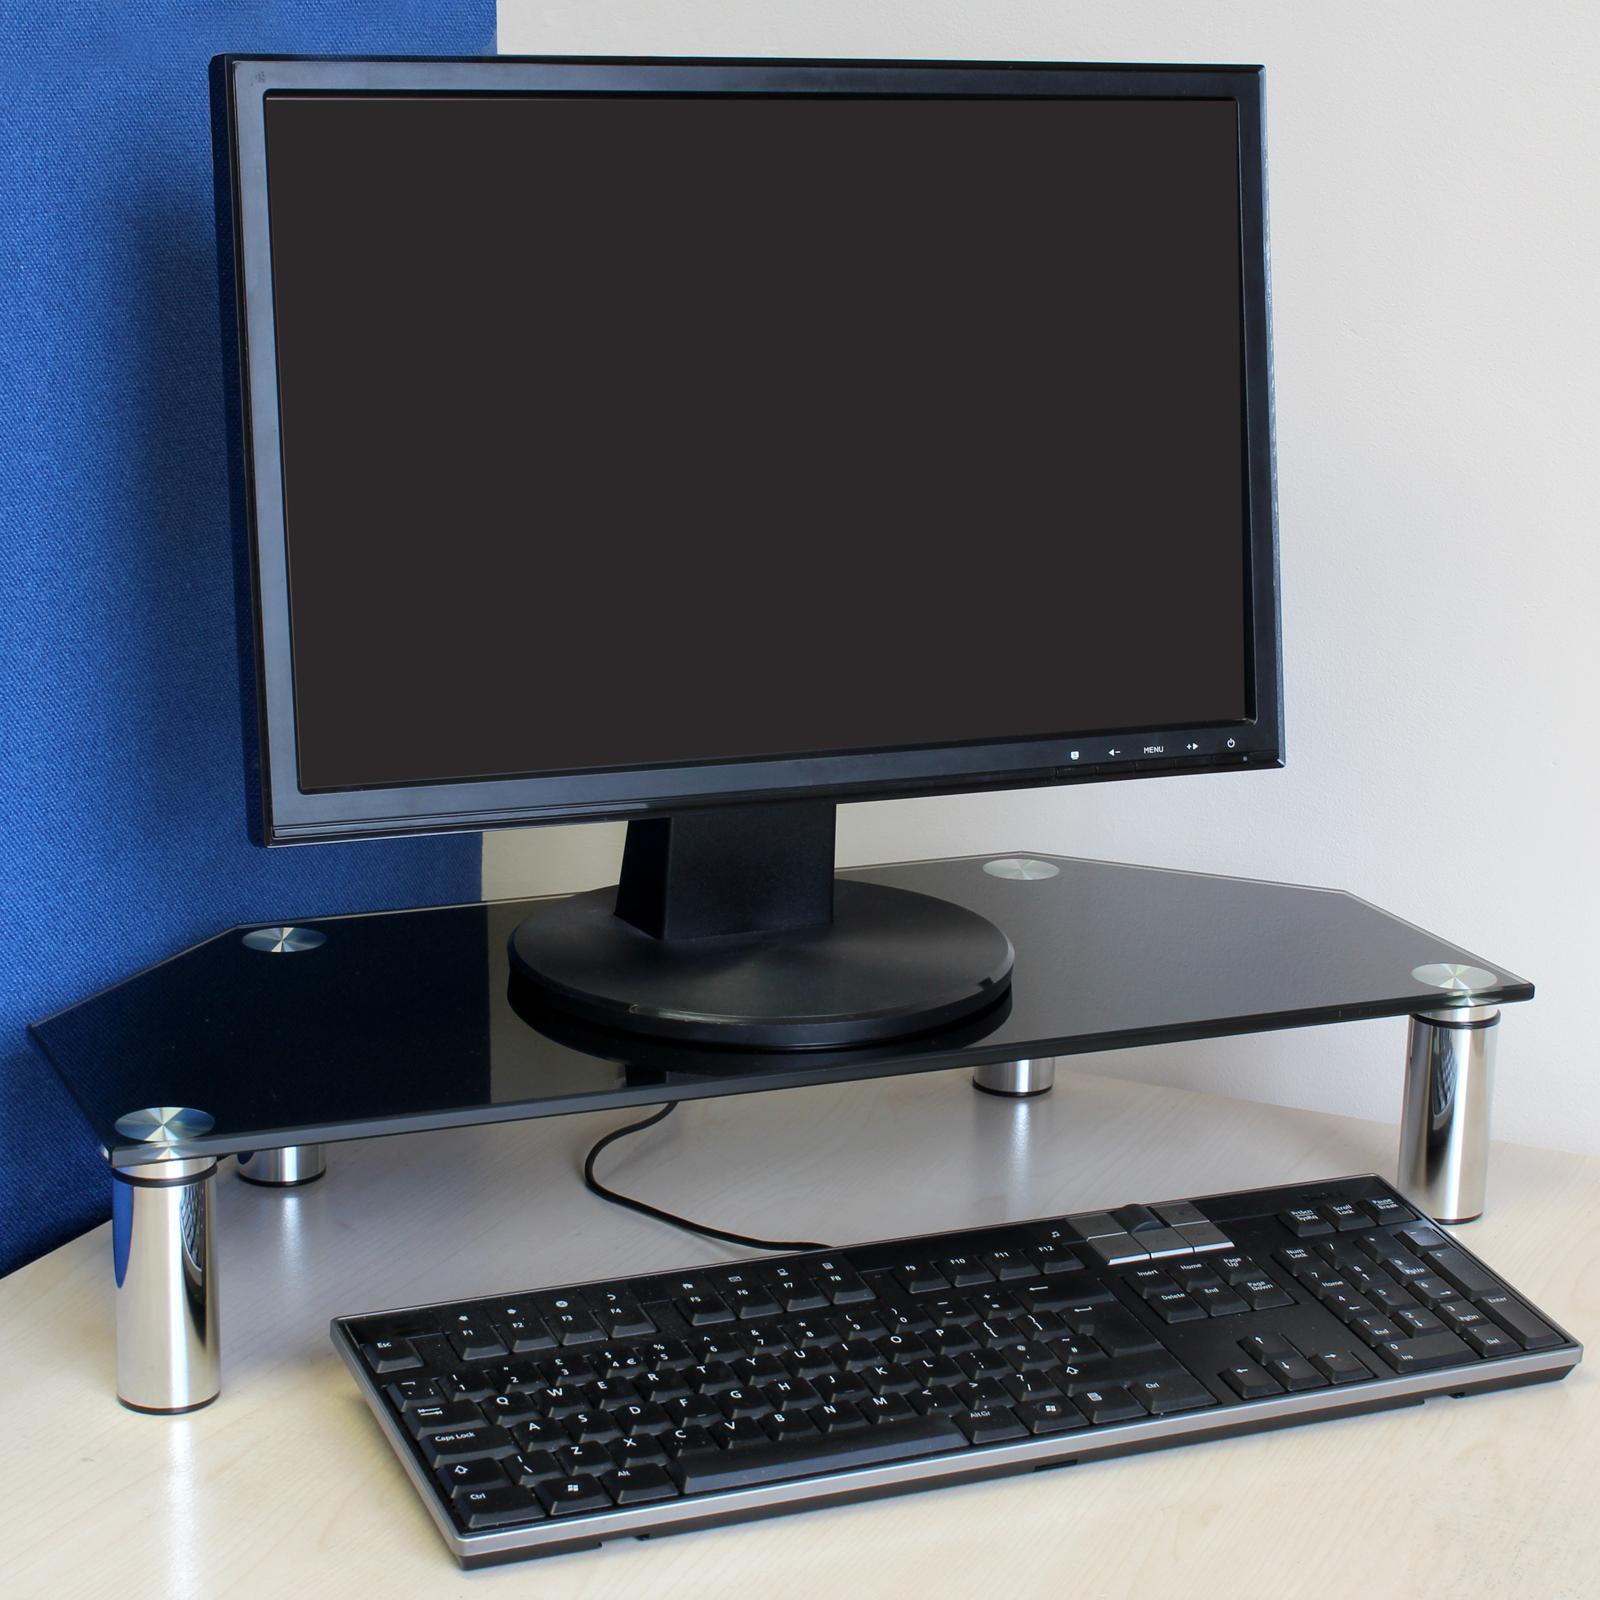 Famous Mac Computer Desk Imac Desks Imac Computer Tables & Apple Mac  WJ36